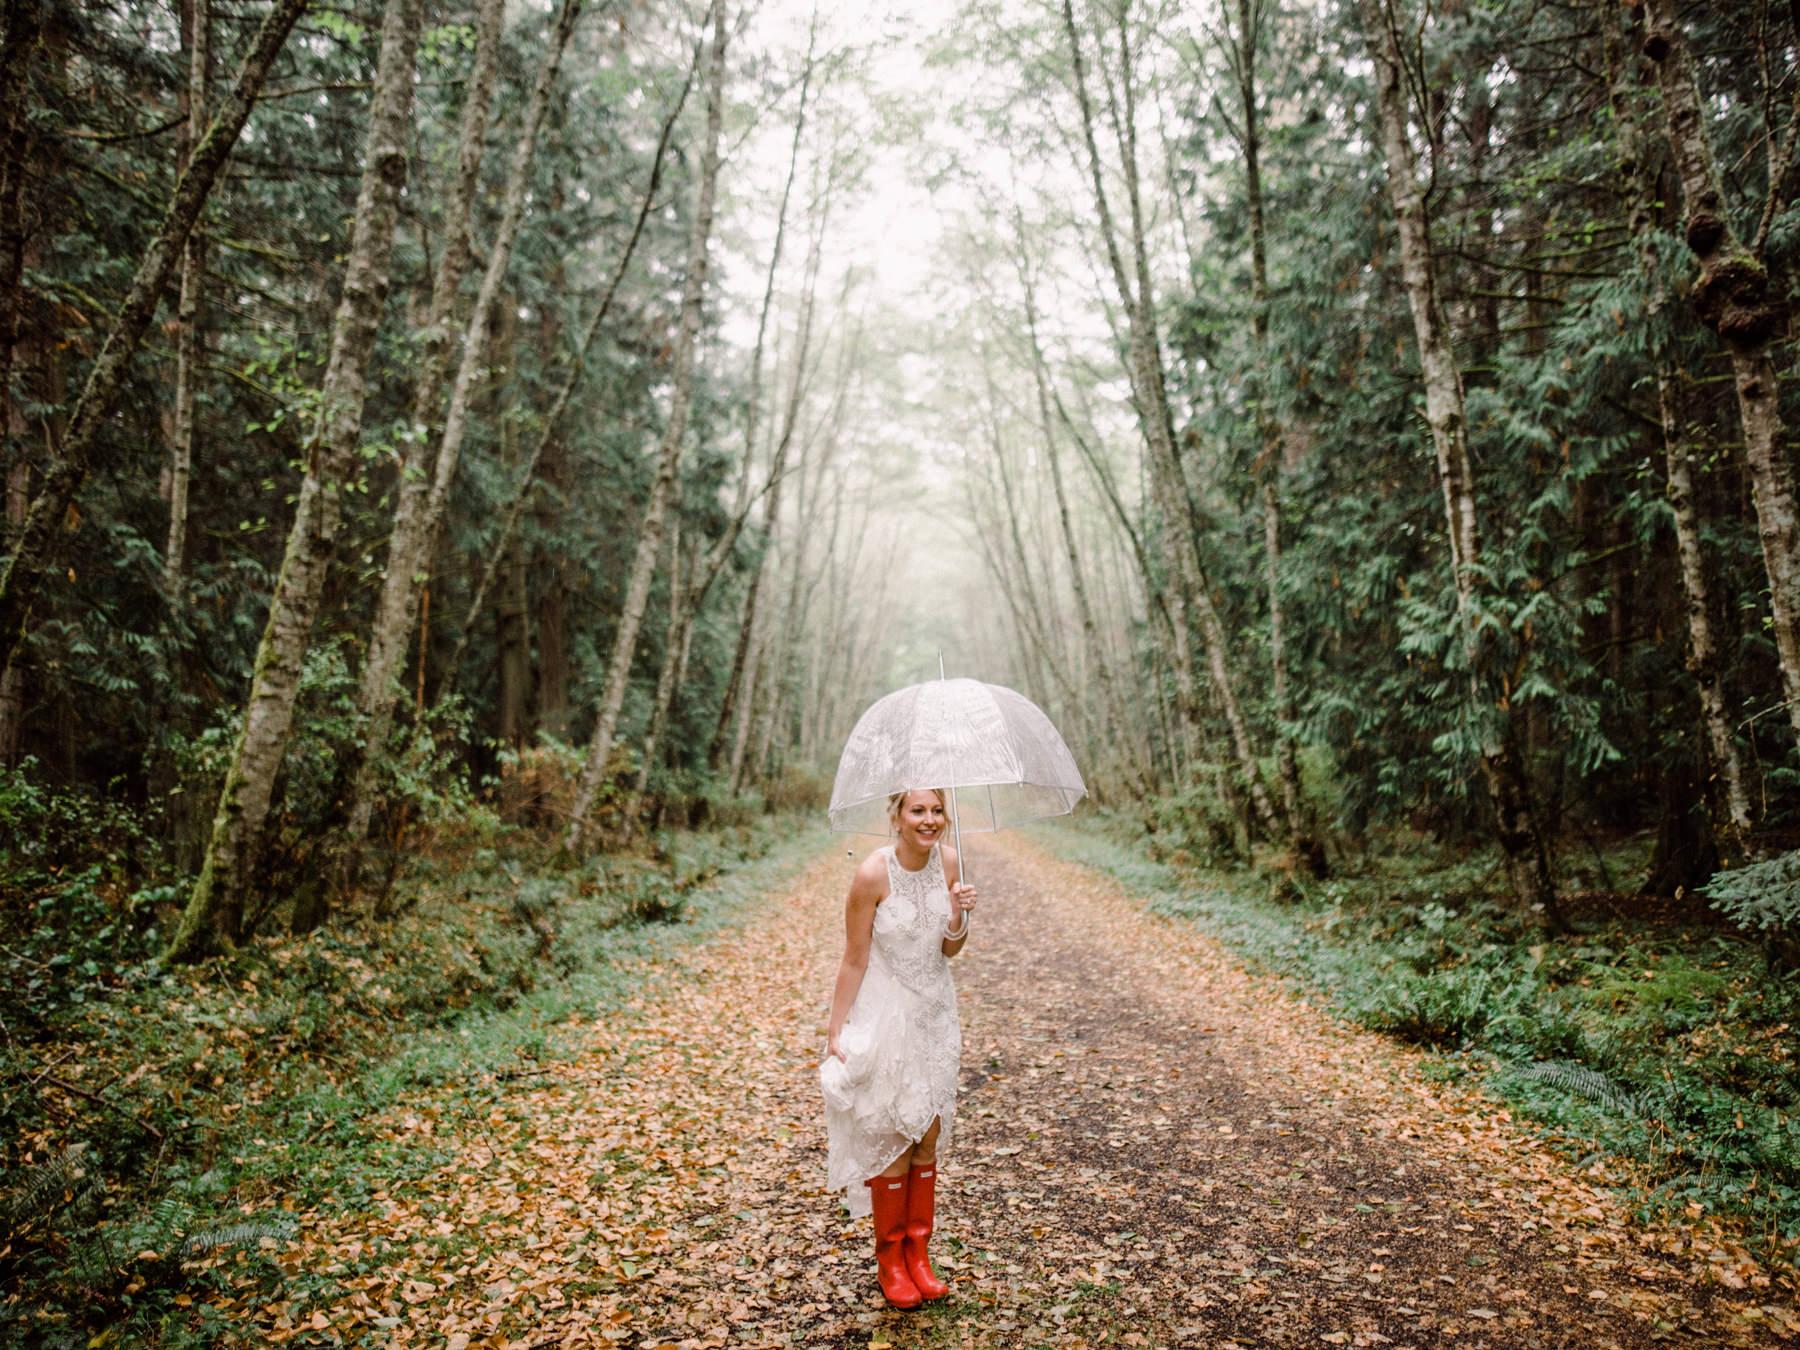 291-colorful-outdoor-lopez-island-wedding.jpg